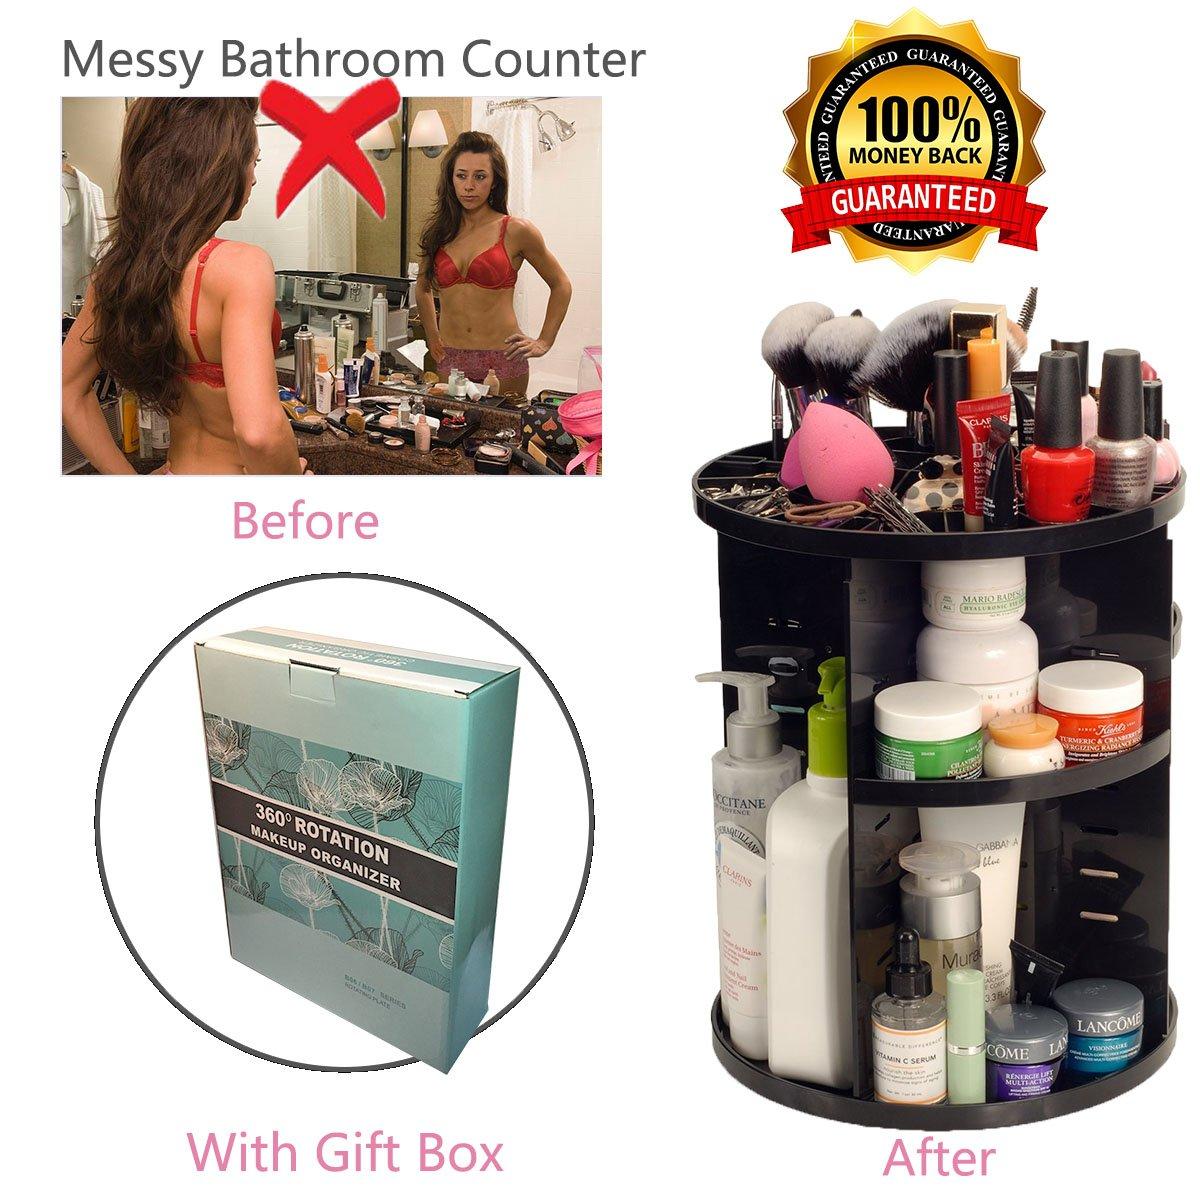 DQ 360 Degree Rotating Makeup Organizer,Bathroom Cosmetic Storage Box,Beauty Makeup Holder,Bathroom Counter Organizer for transformed bathroom counter(black)